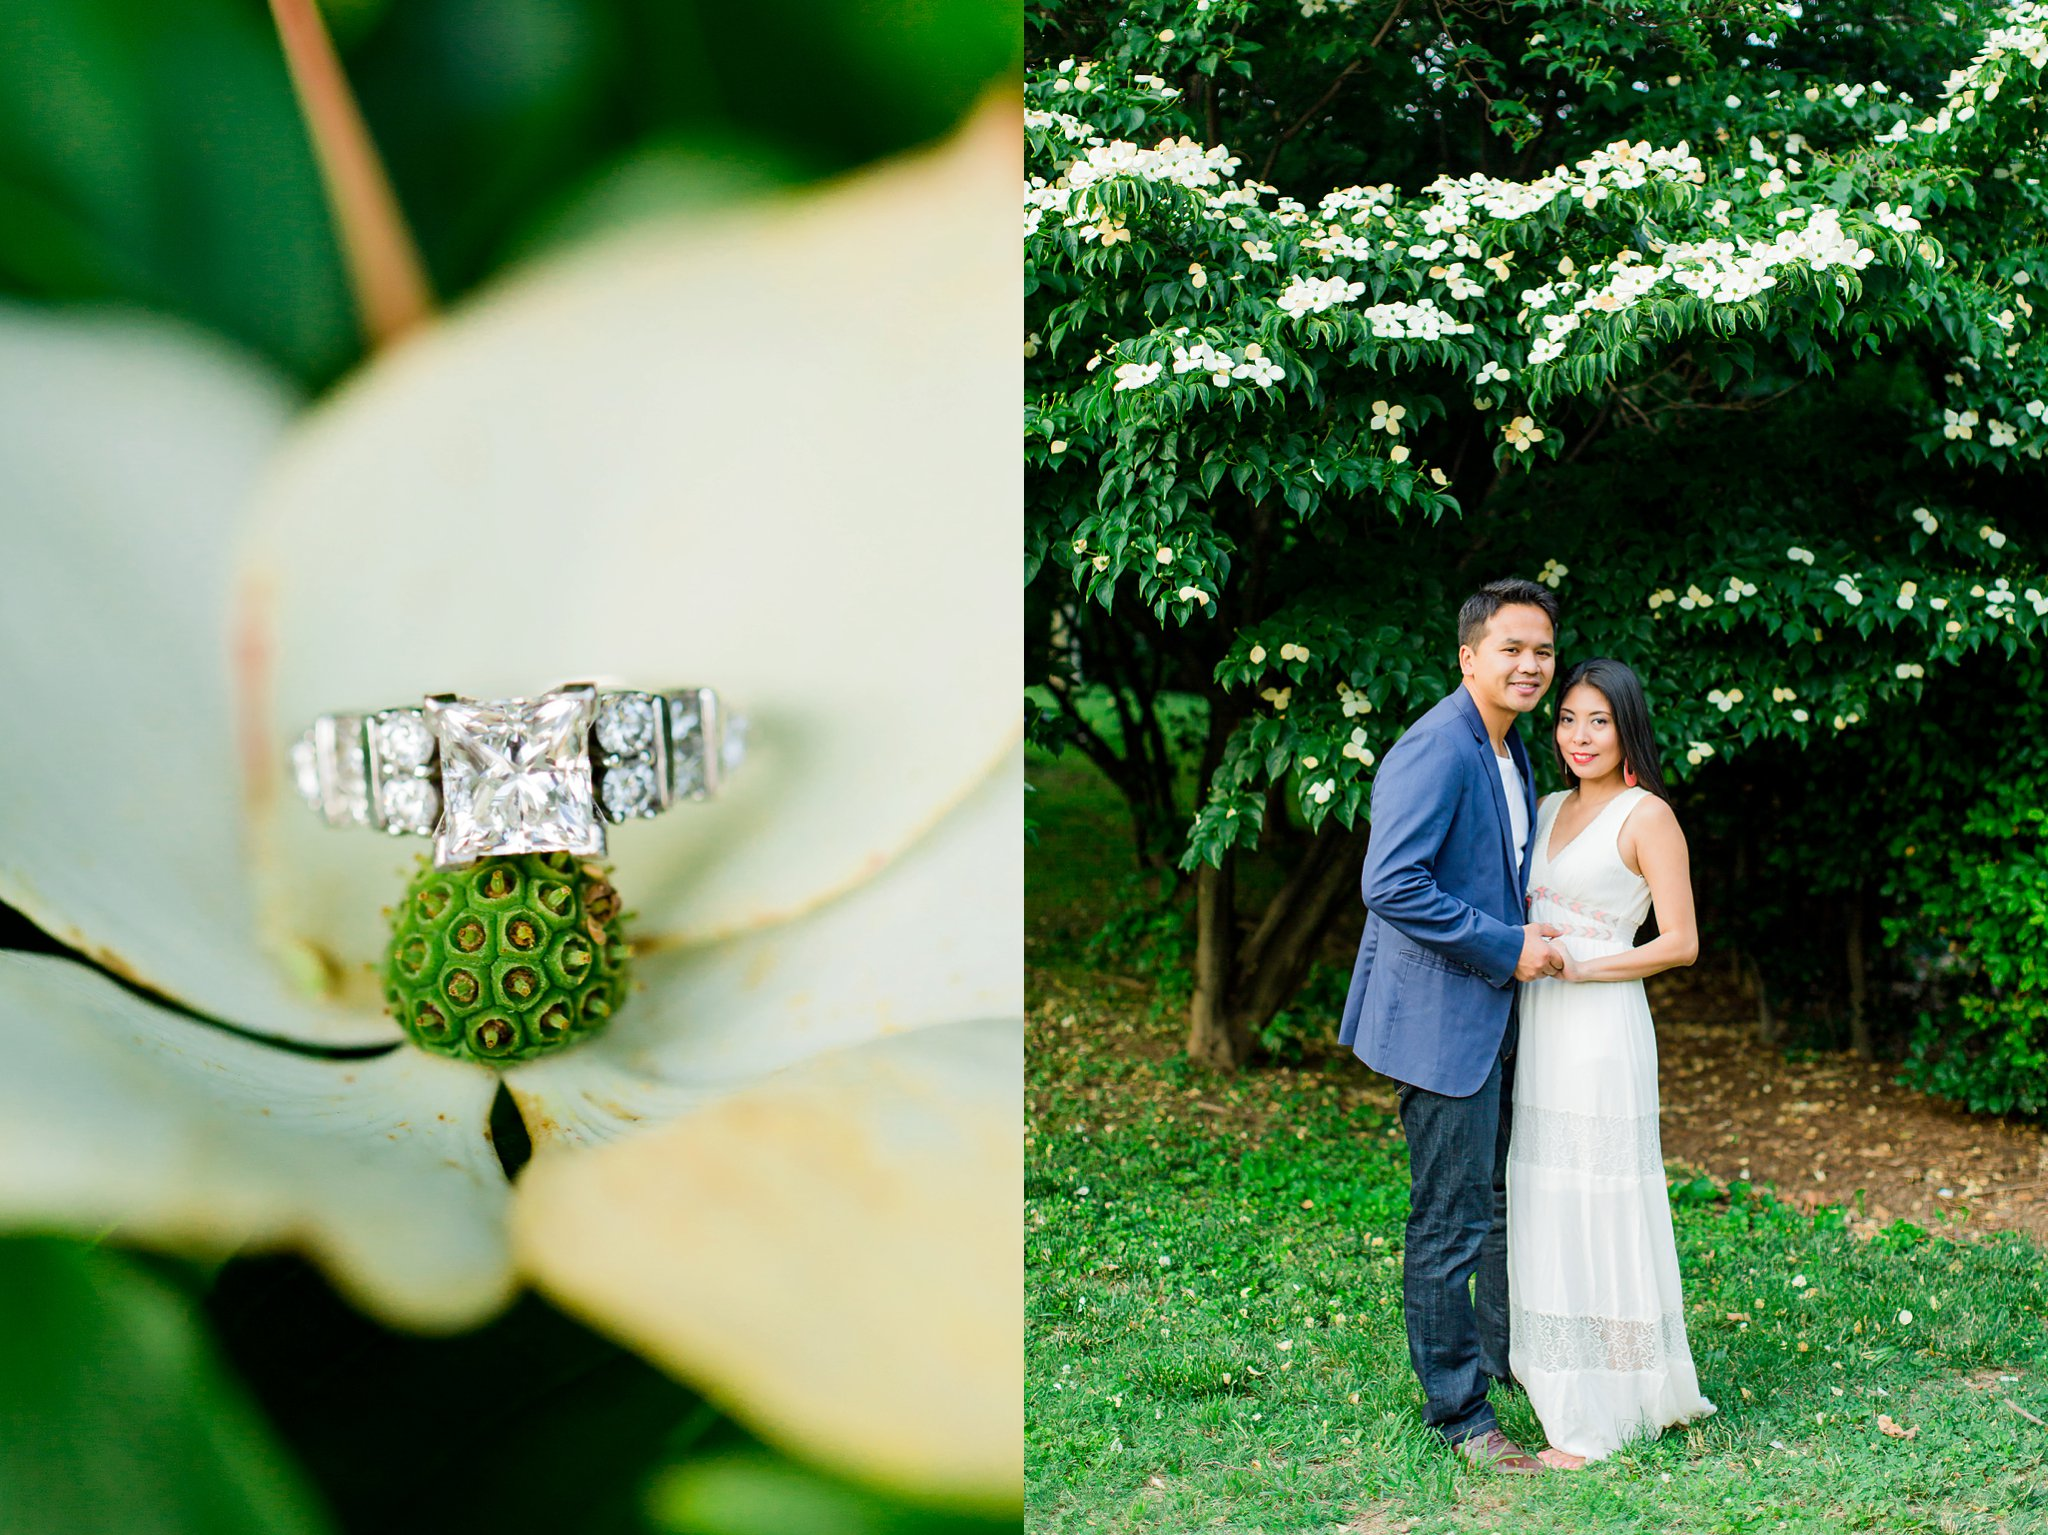 Thin & Phil Meridian Hill Park DC Engagement Photos-127.jpg